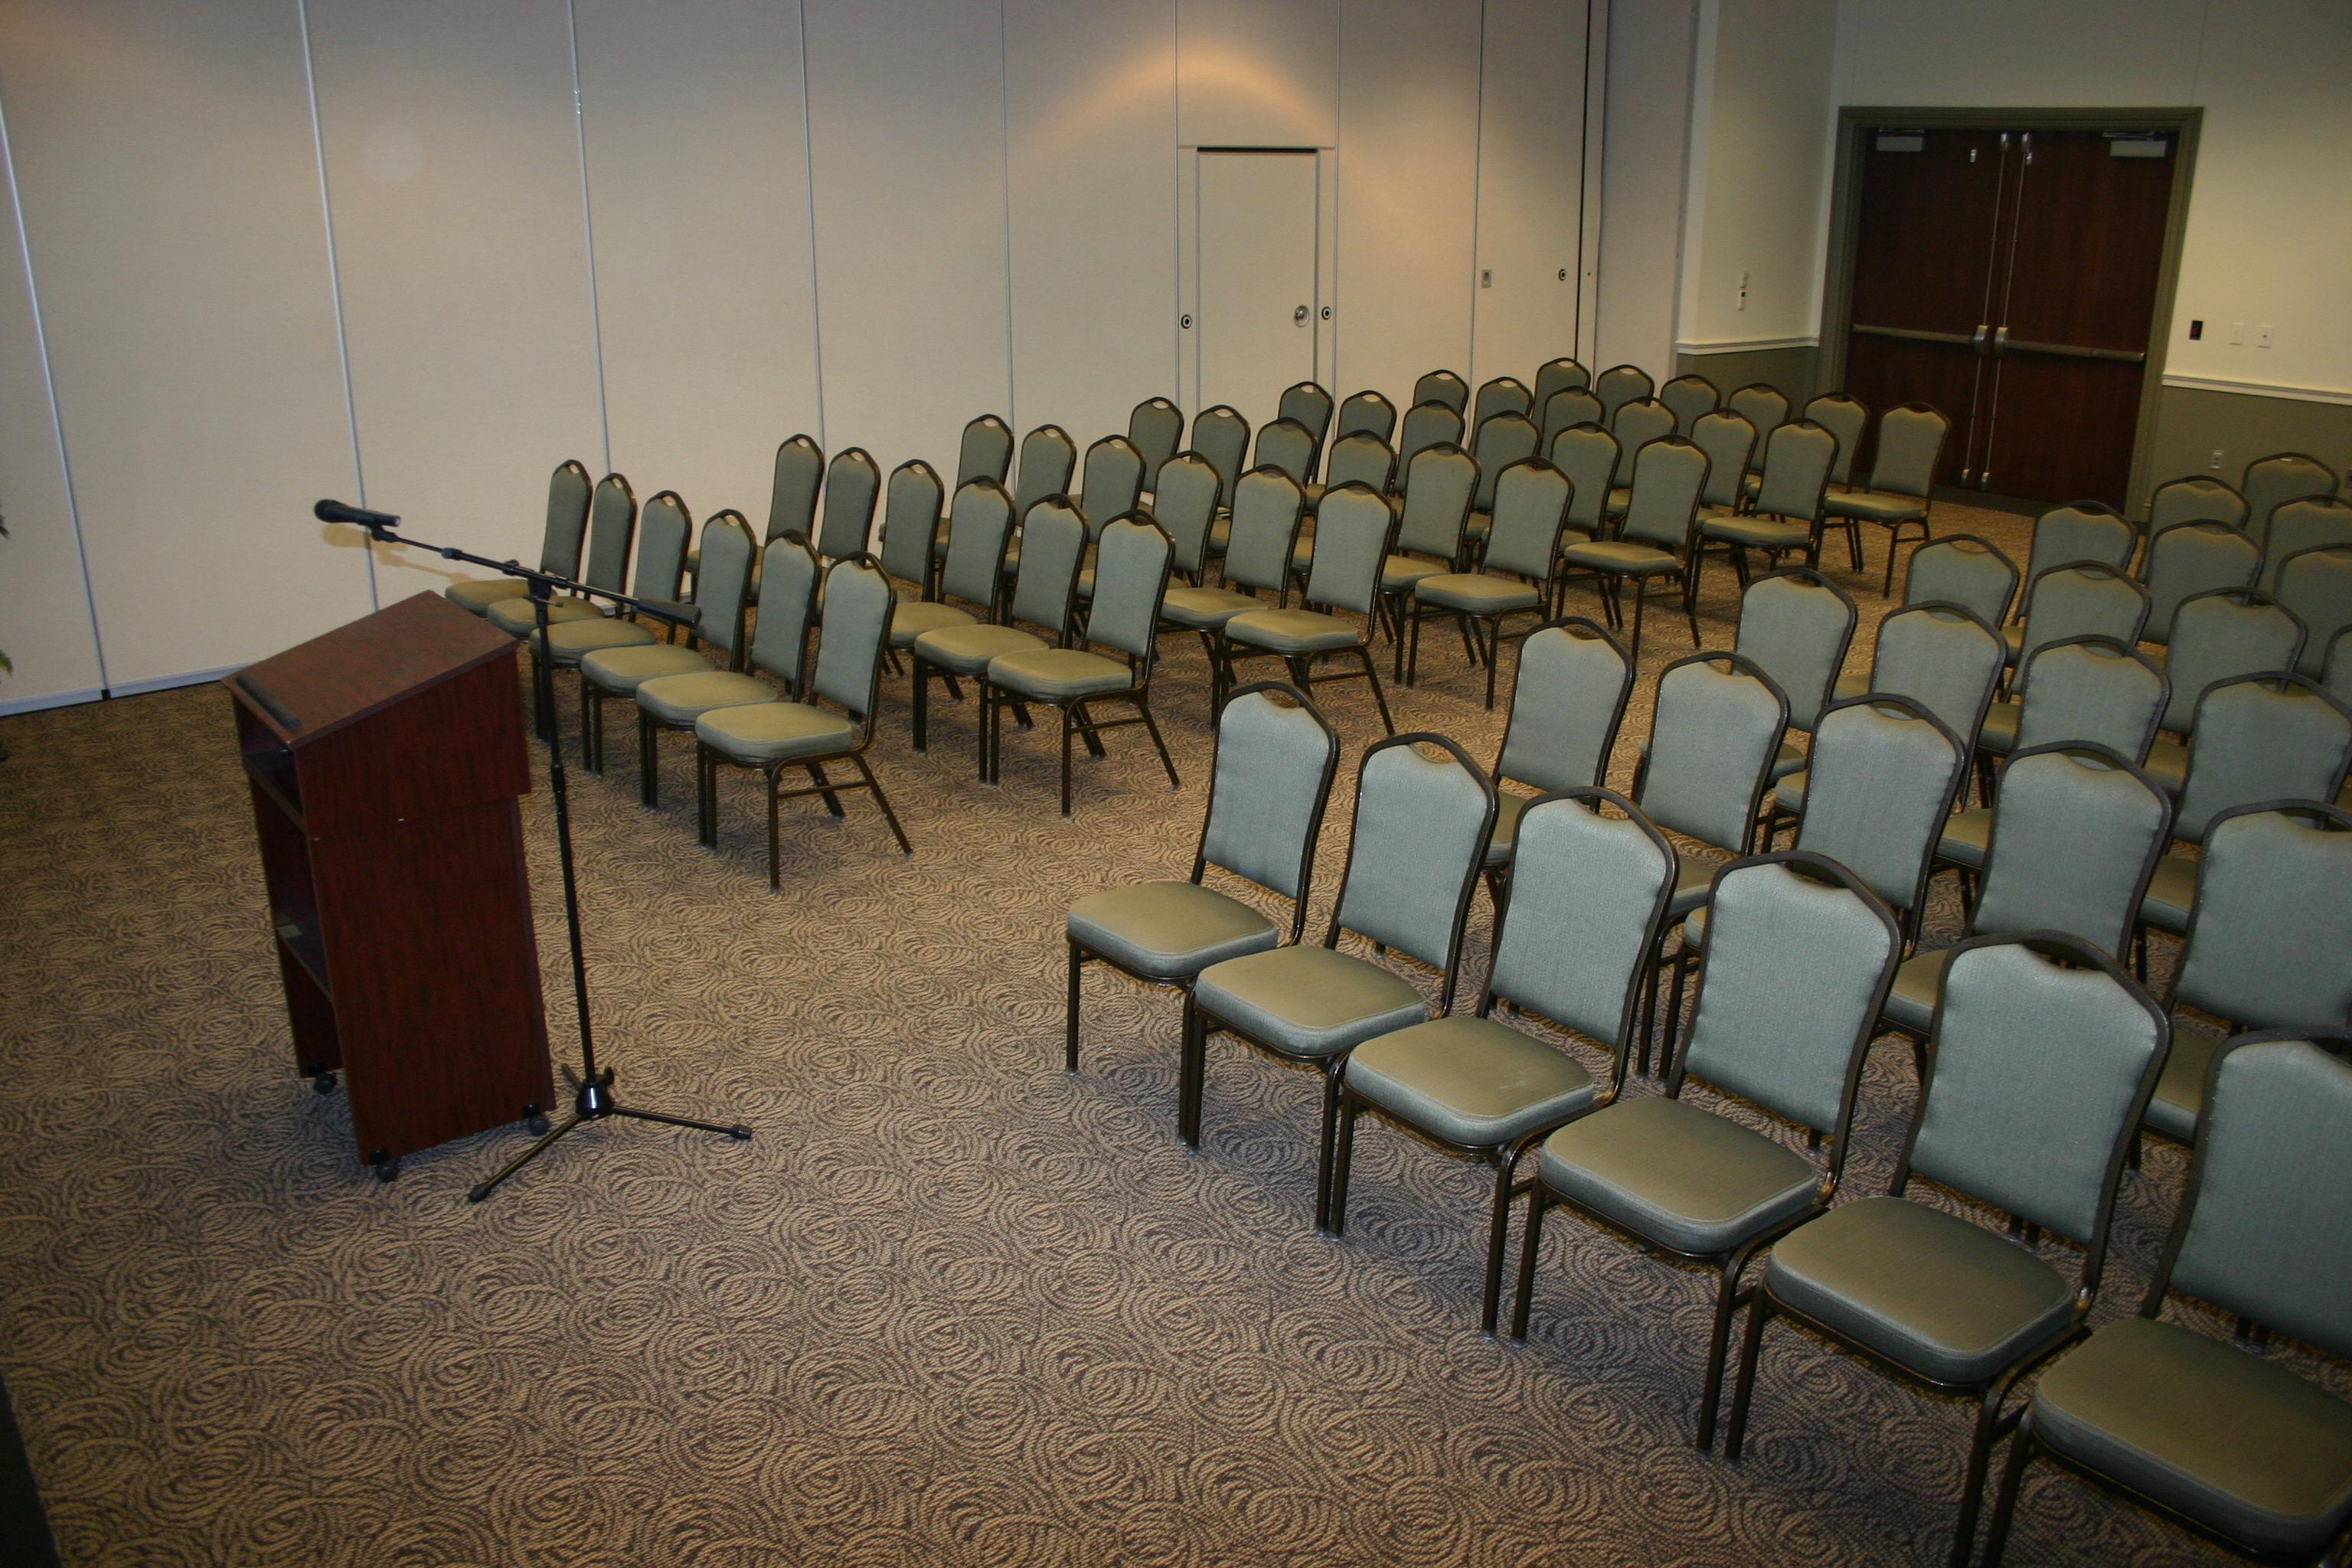 Magnolia Meeting Room Theatre Style